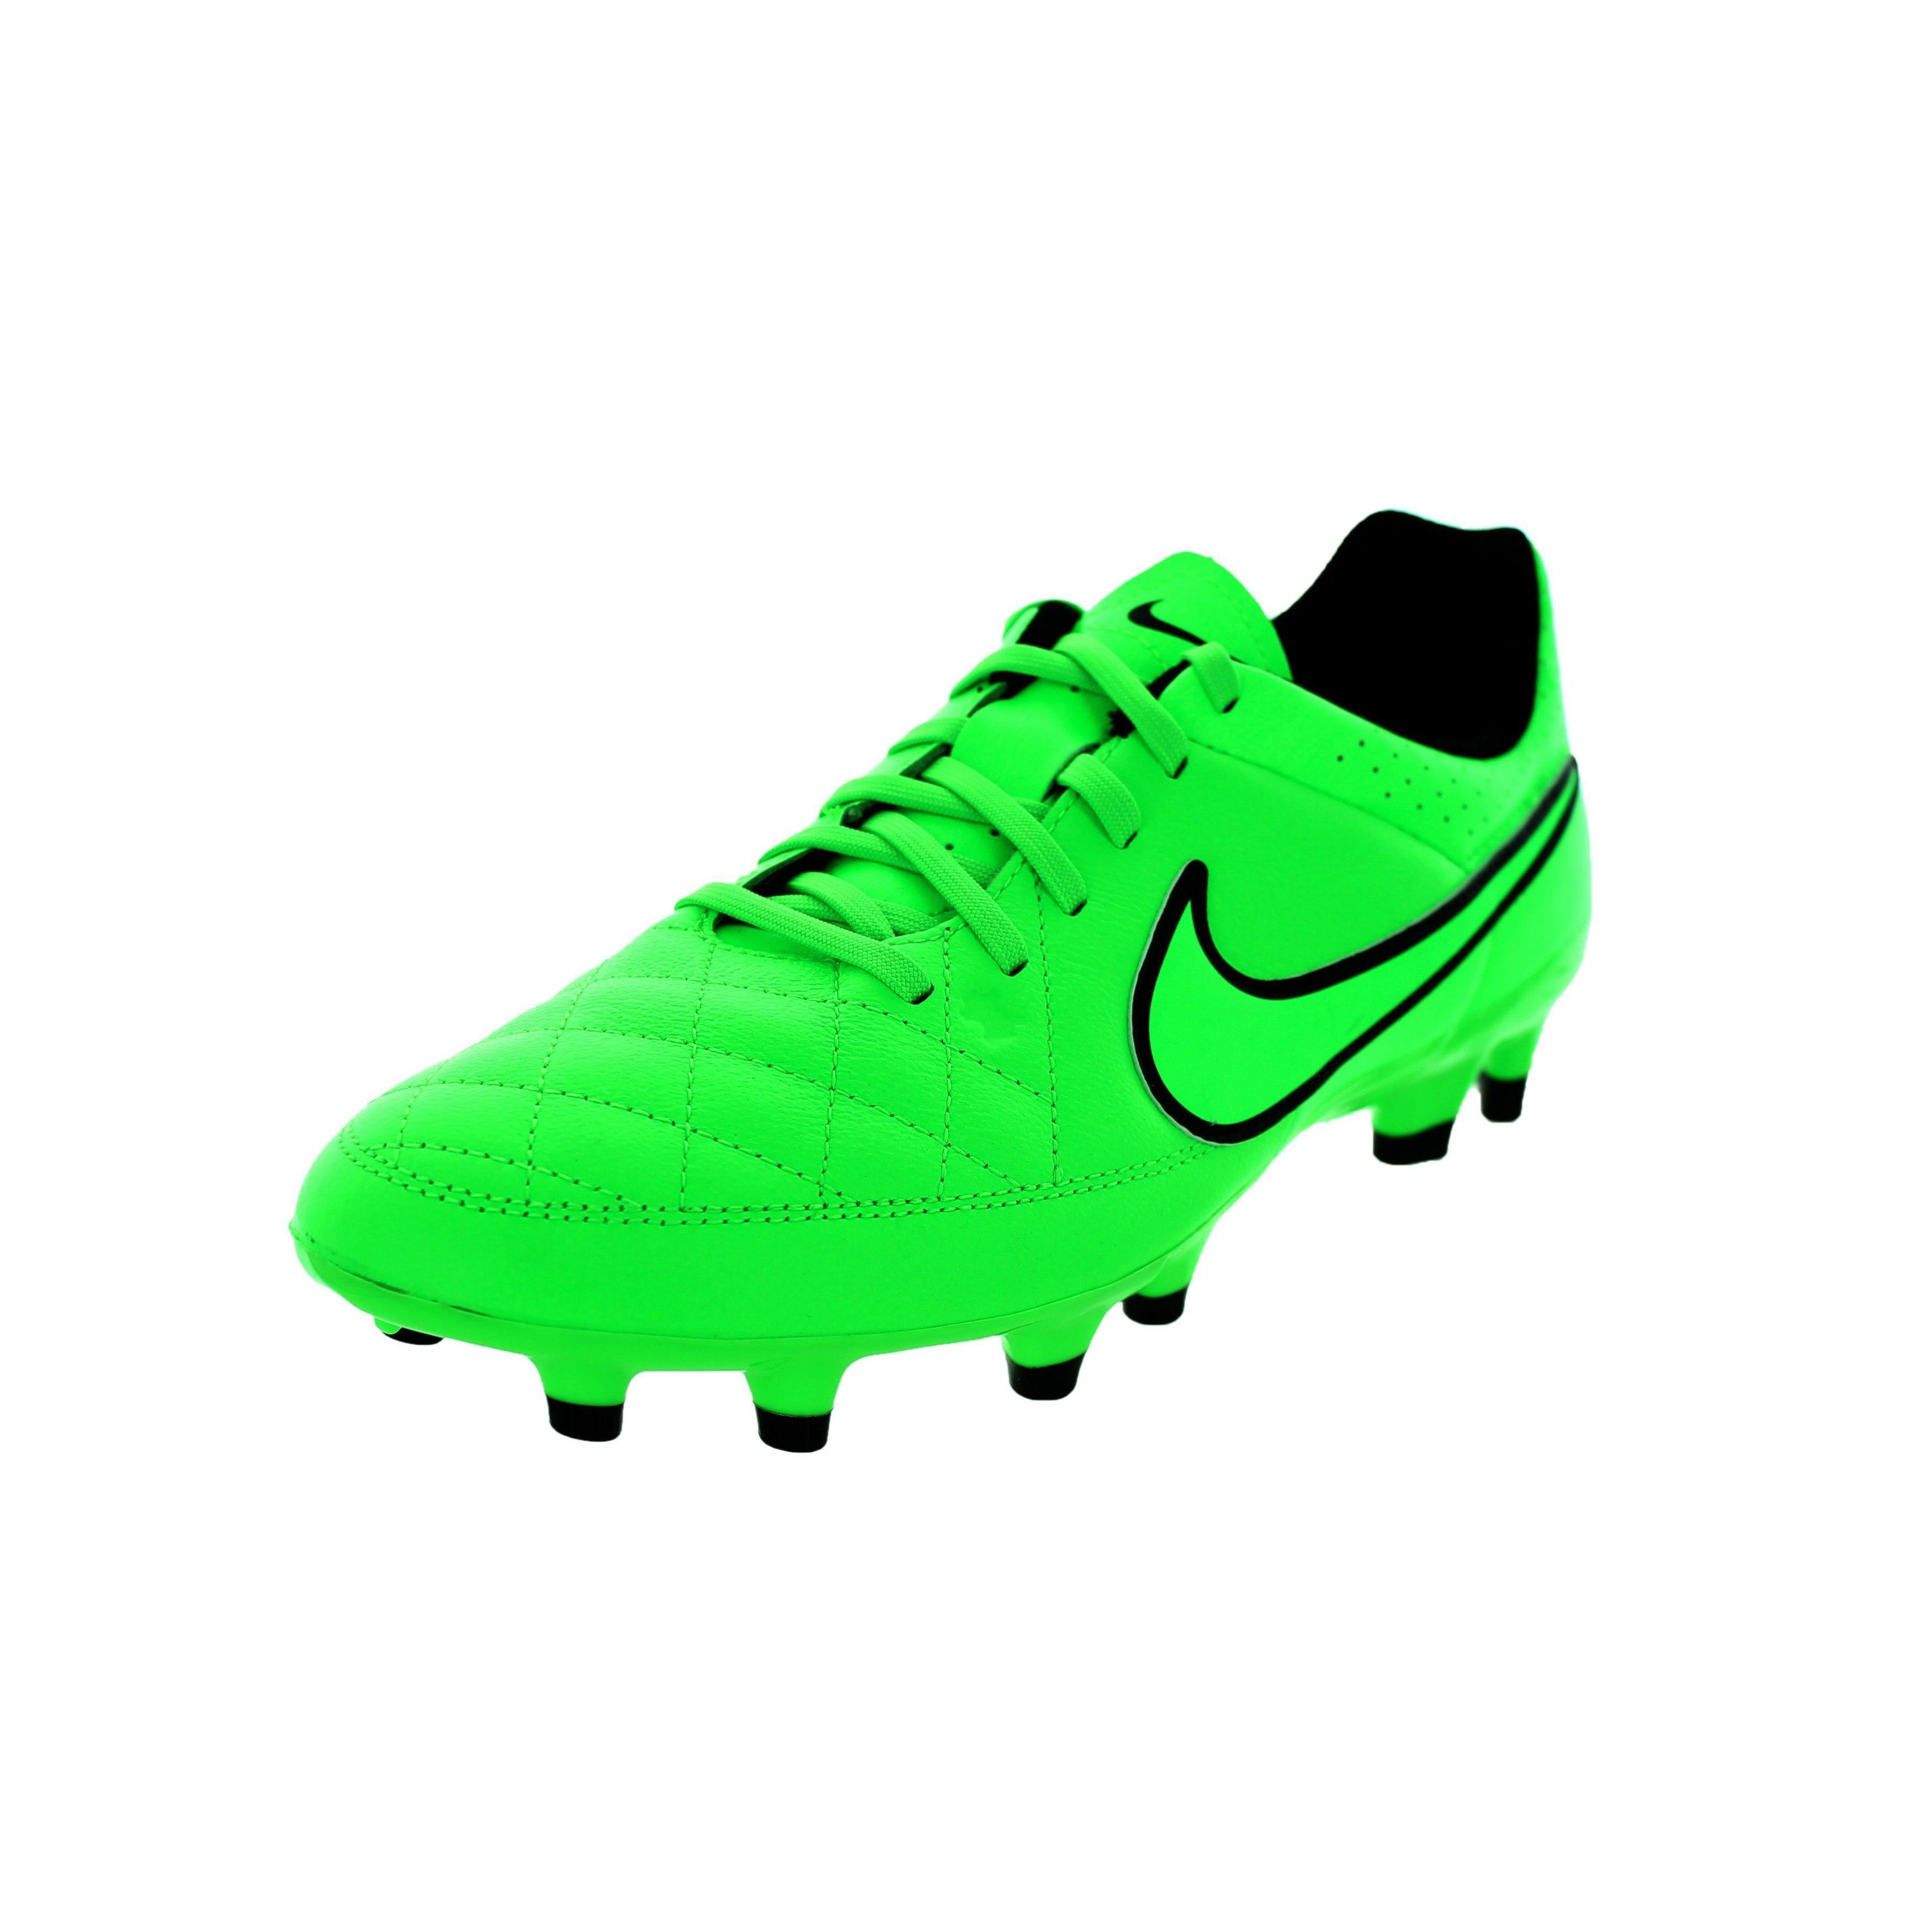 Football boots · Nike Men's Tiempo Genio FG Strike/Black Soccer Cleats